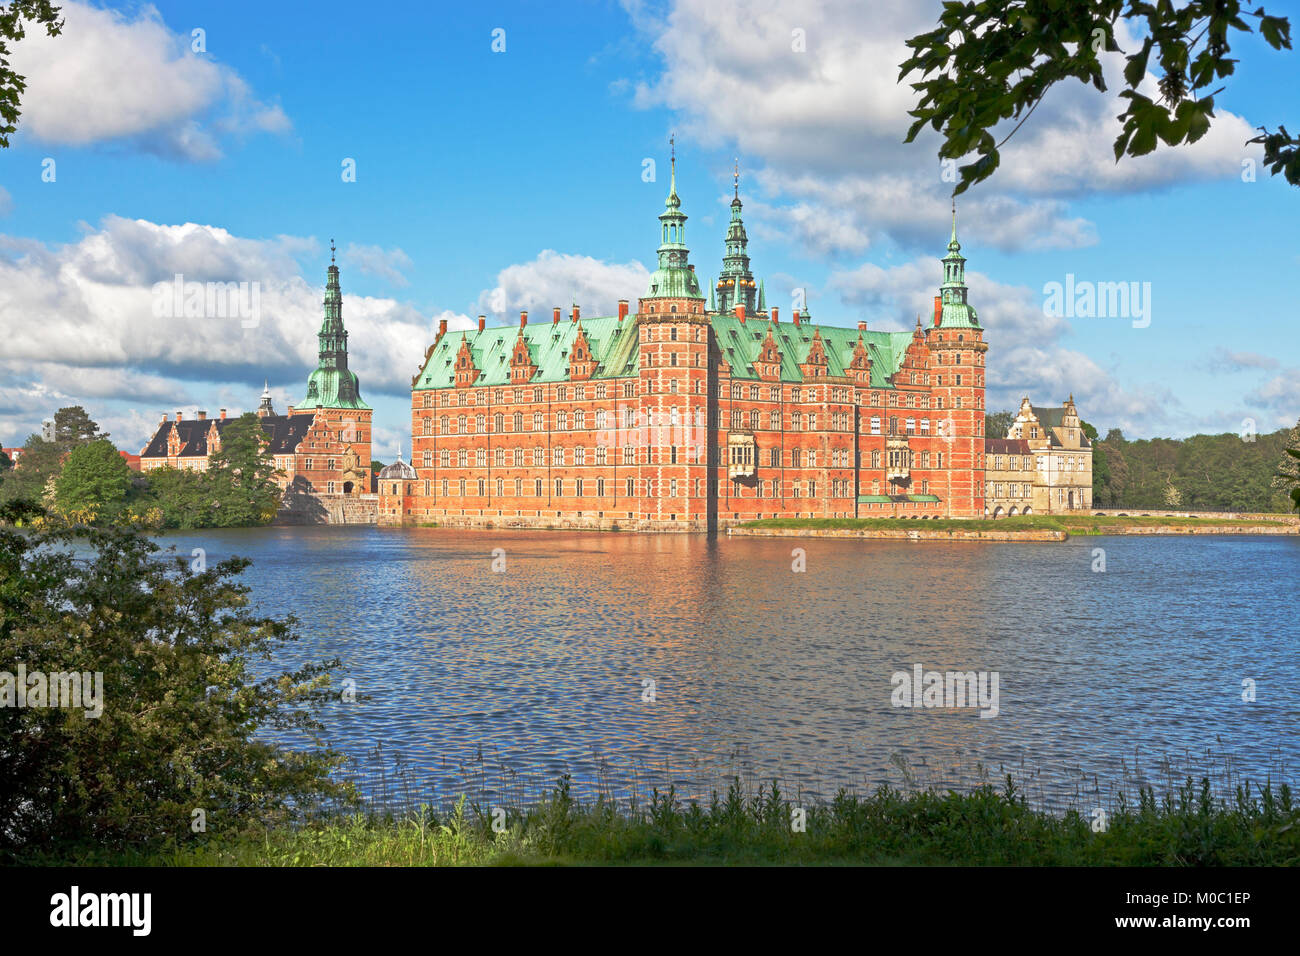 The Frederiksborg Castle in Dutch Renaissance style in Hillerød near Copenhagen, Denmark, in bright summer - Stock Image